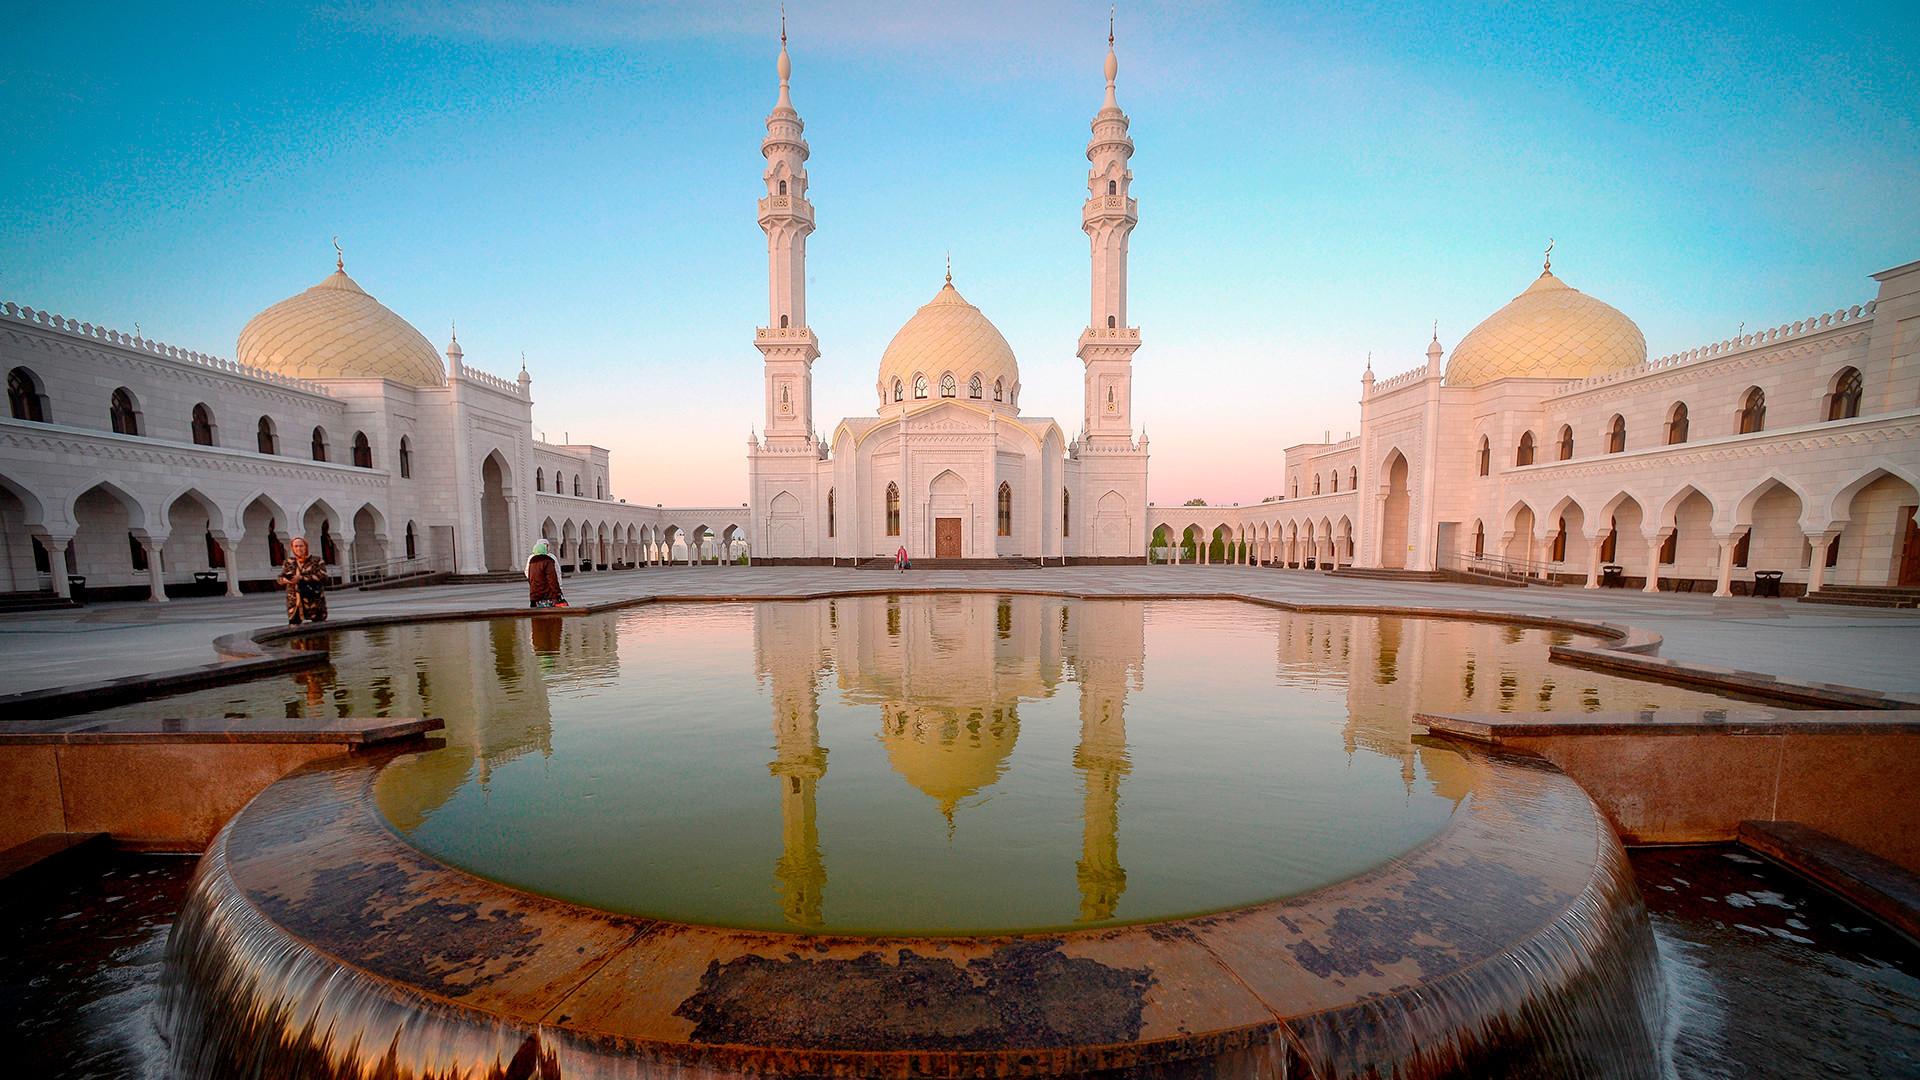 Ak Jami Mosque in the city of Bulgar.